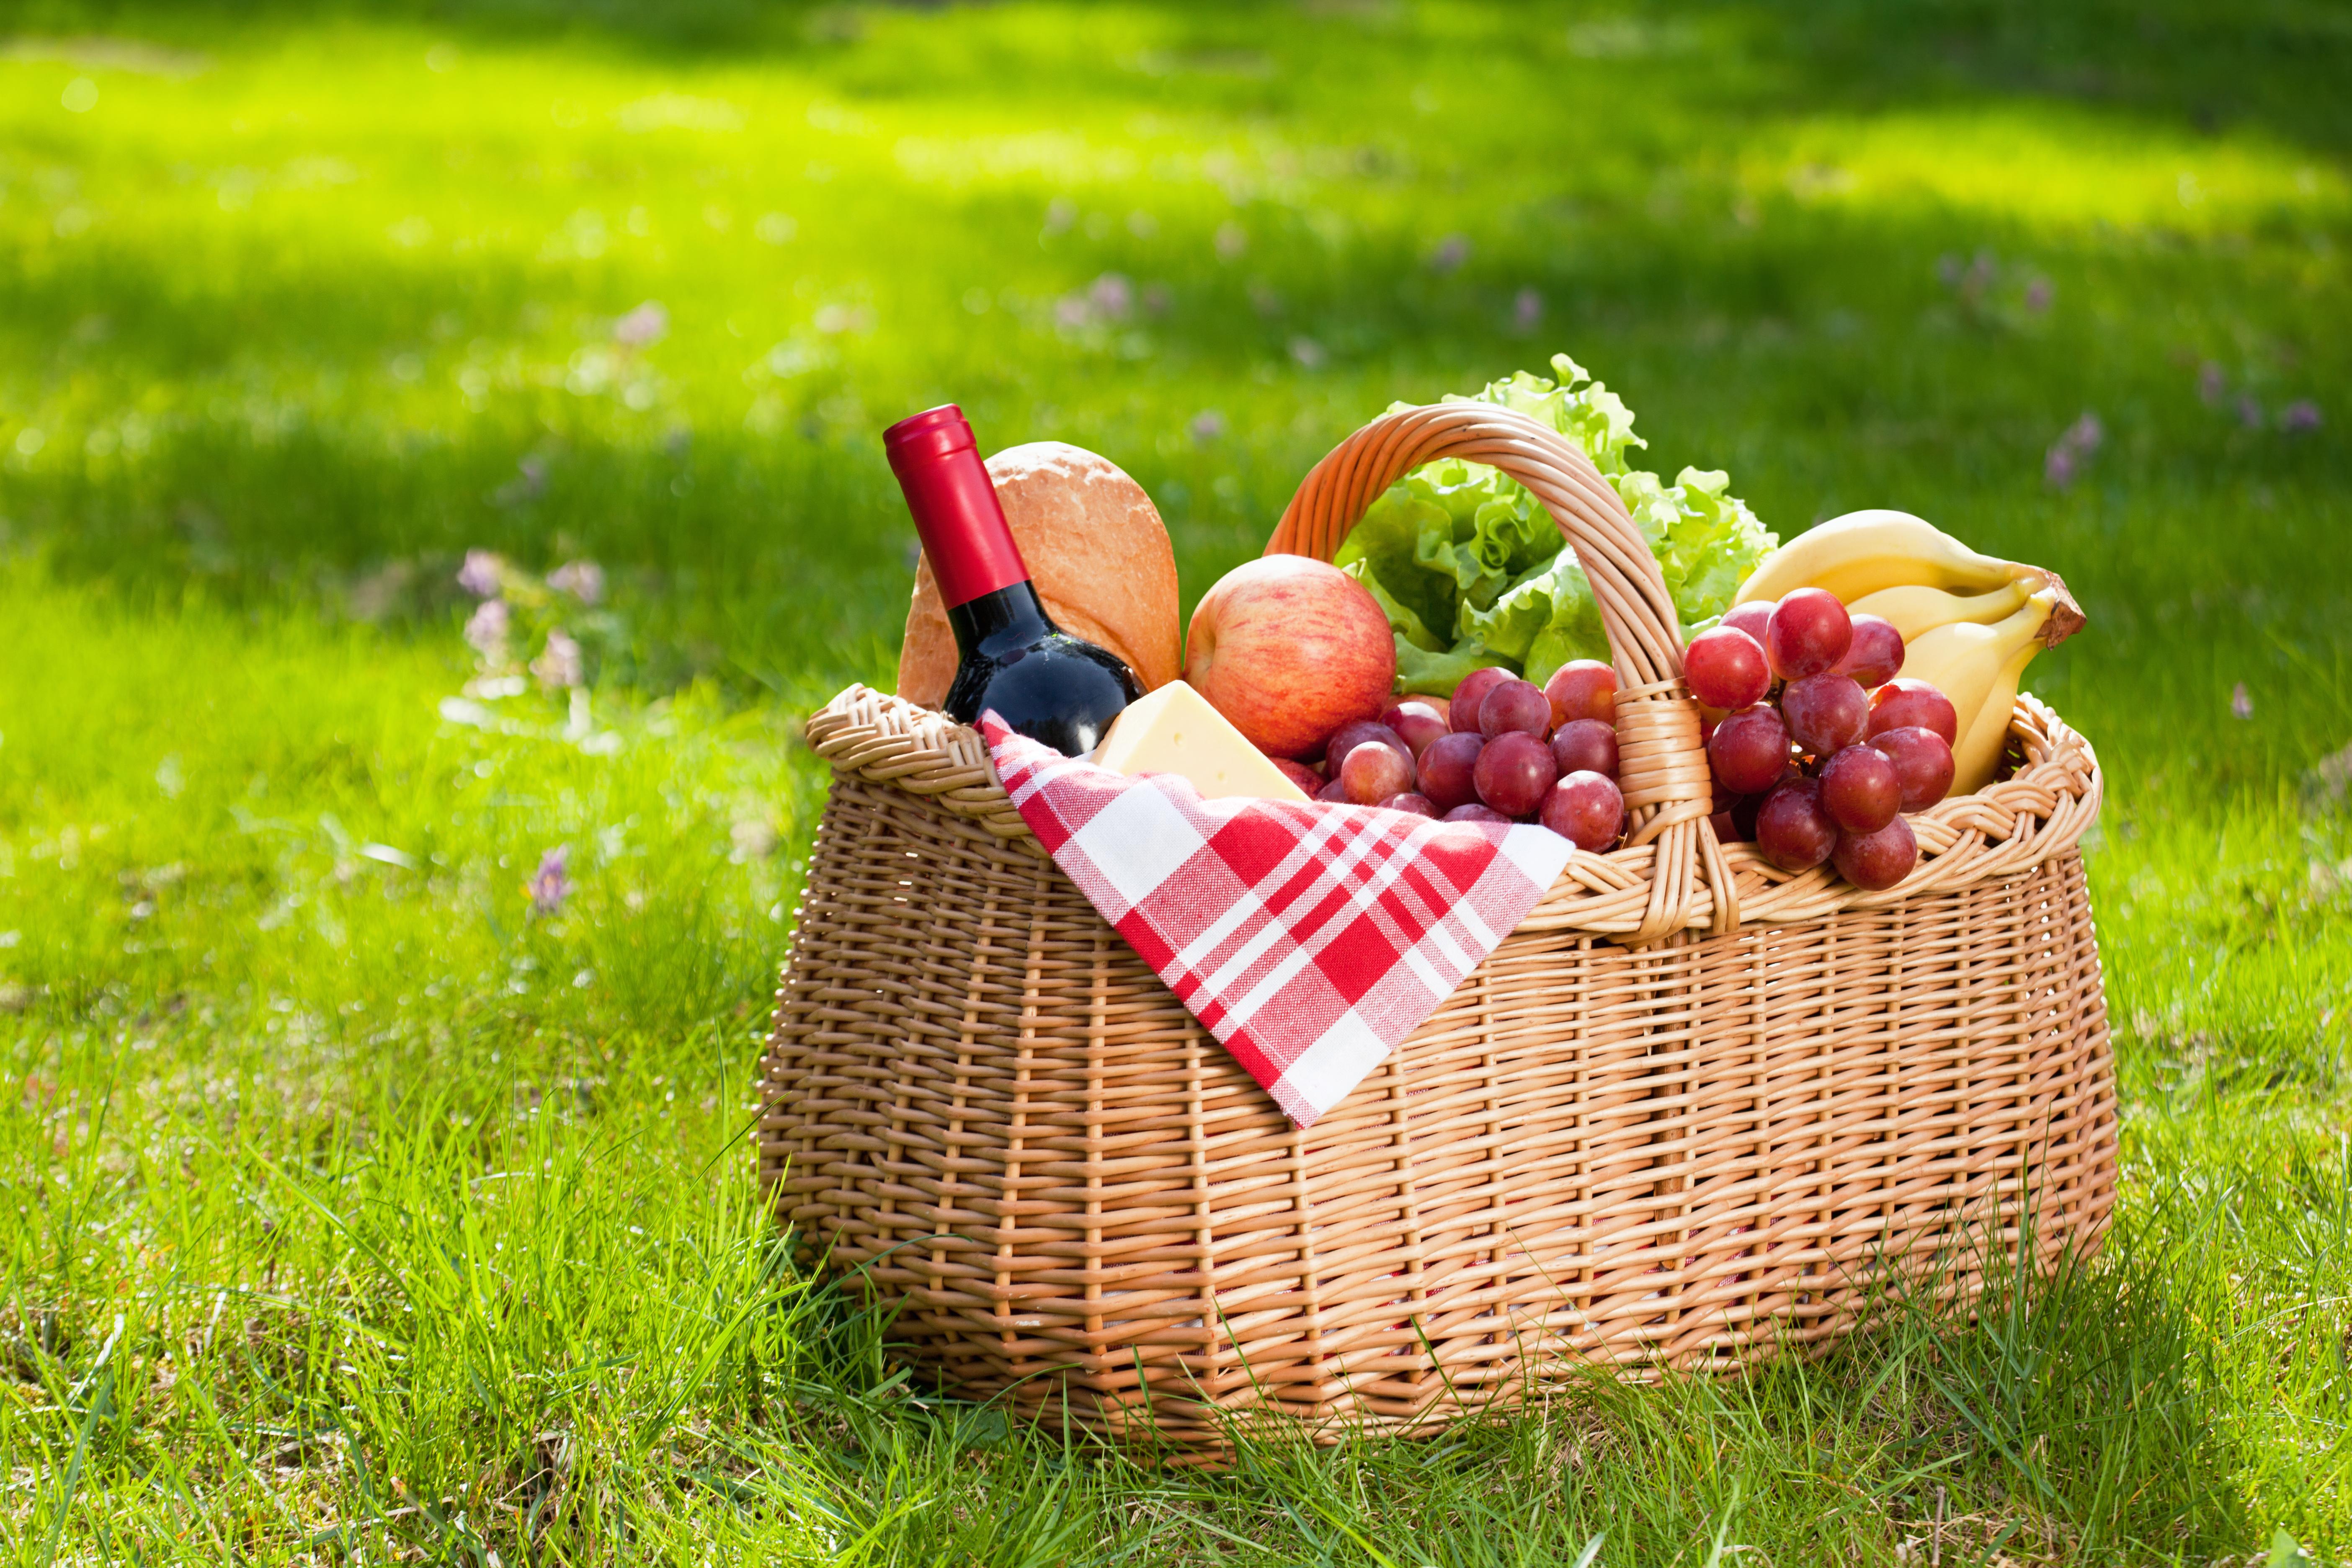 Fill up those picnic baskets.